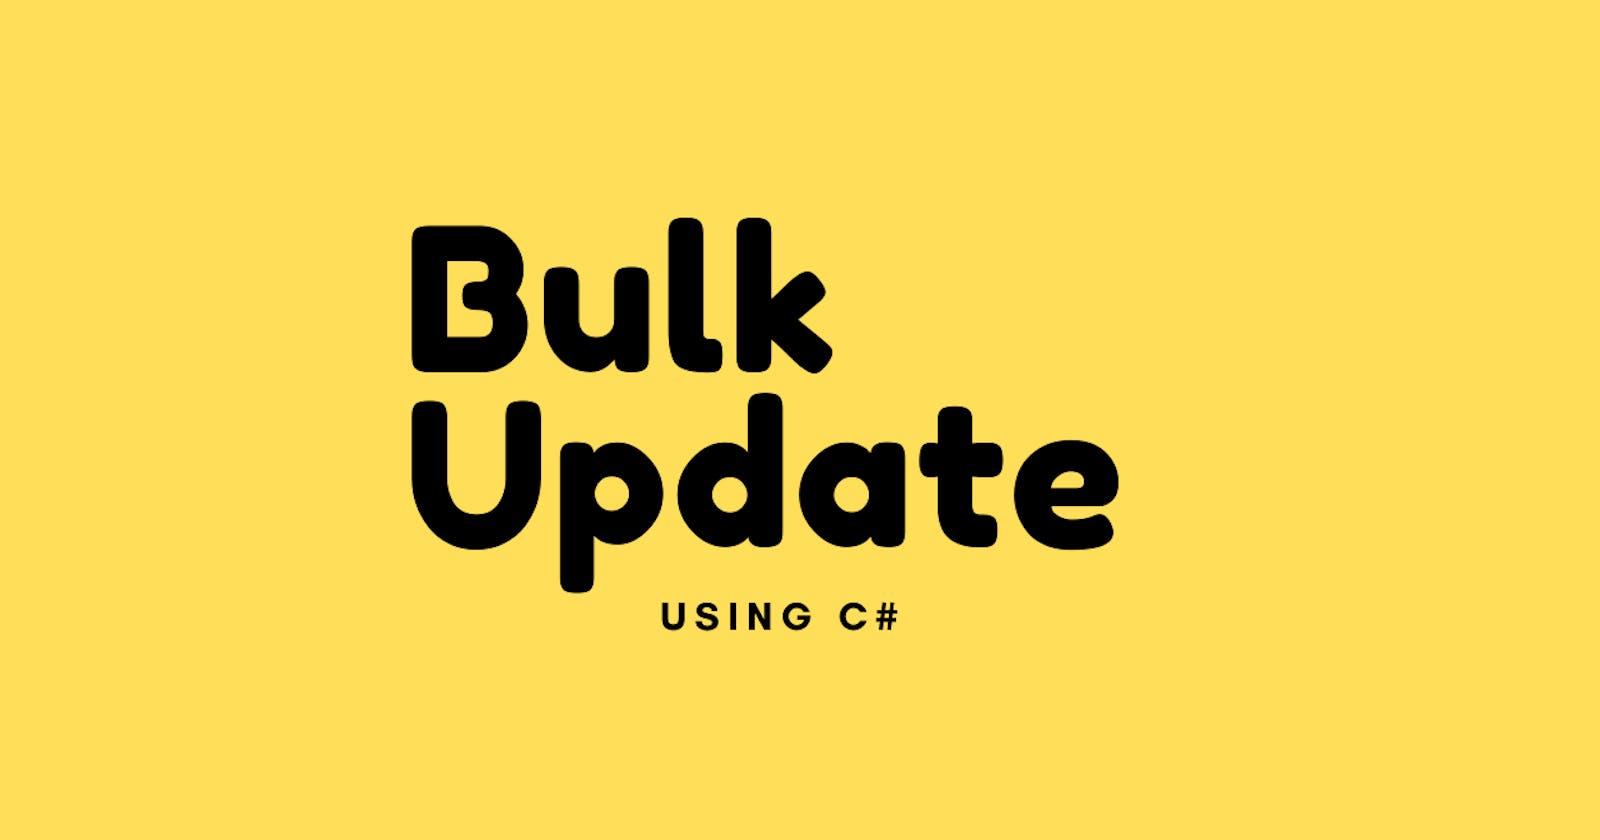 SQL Bulk Update